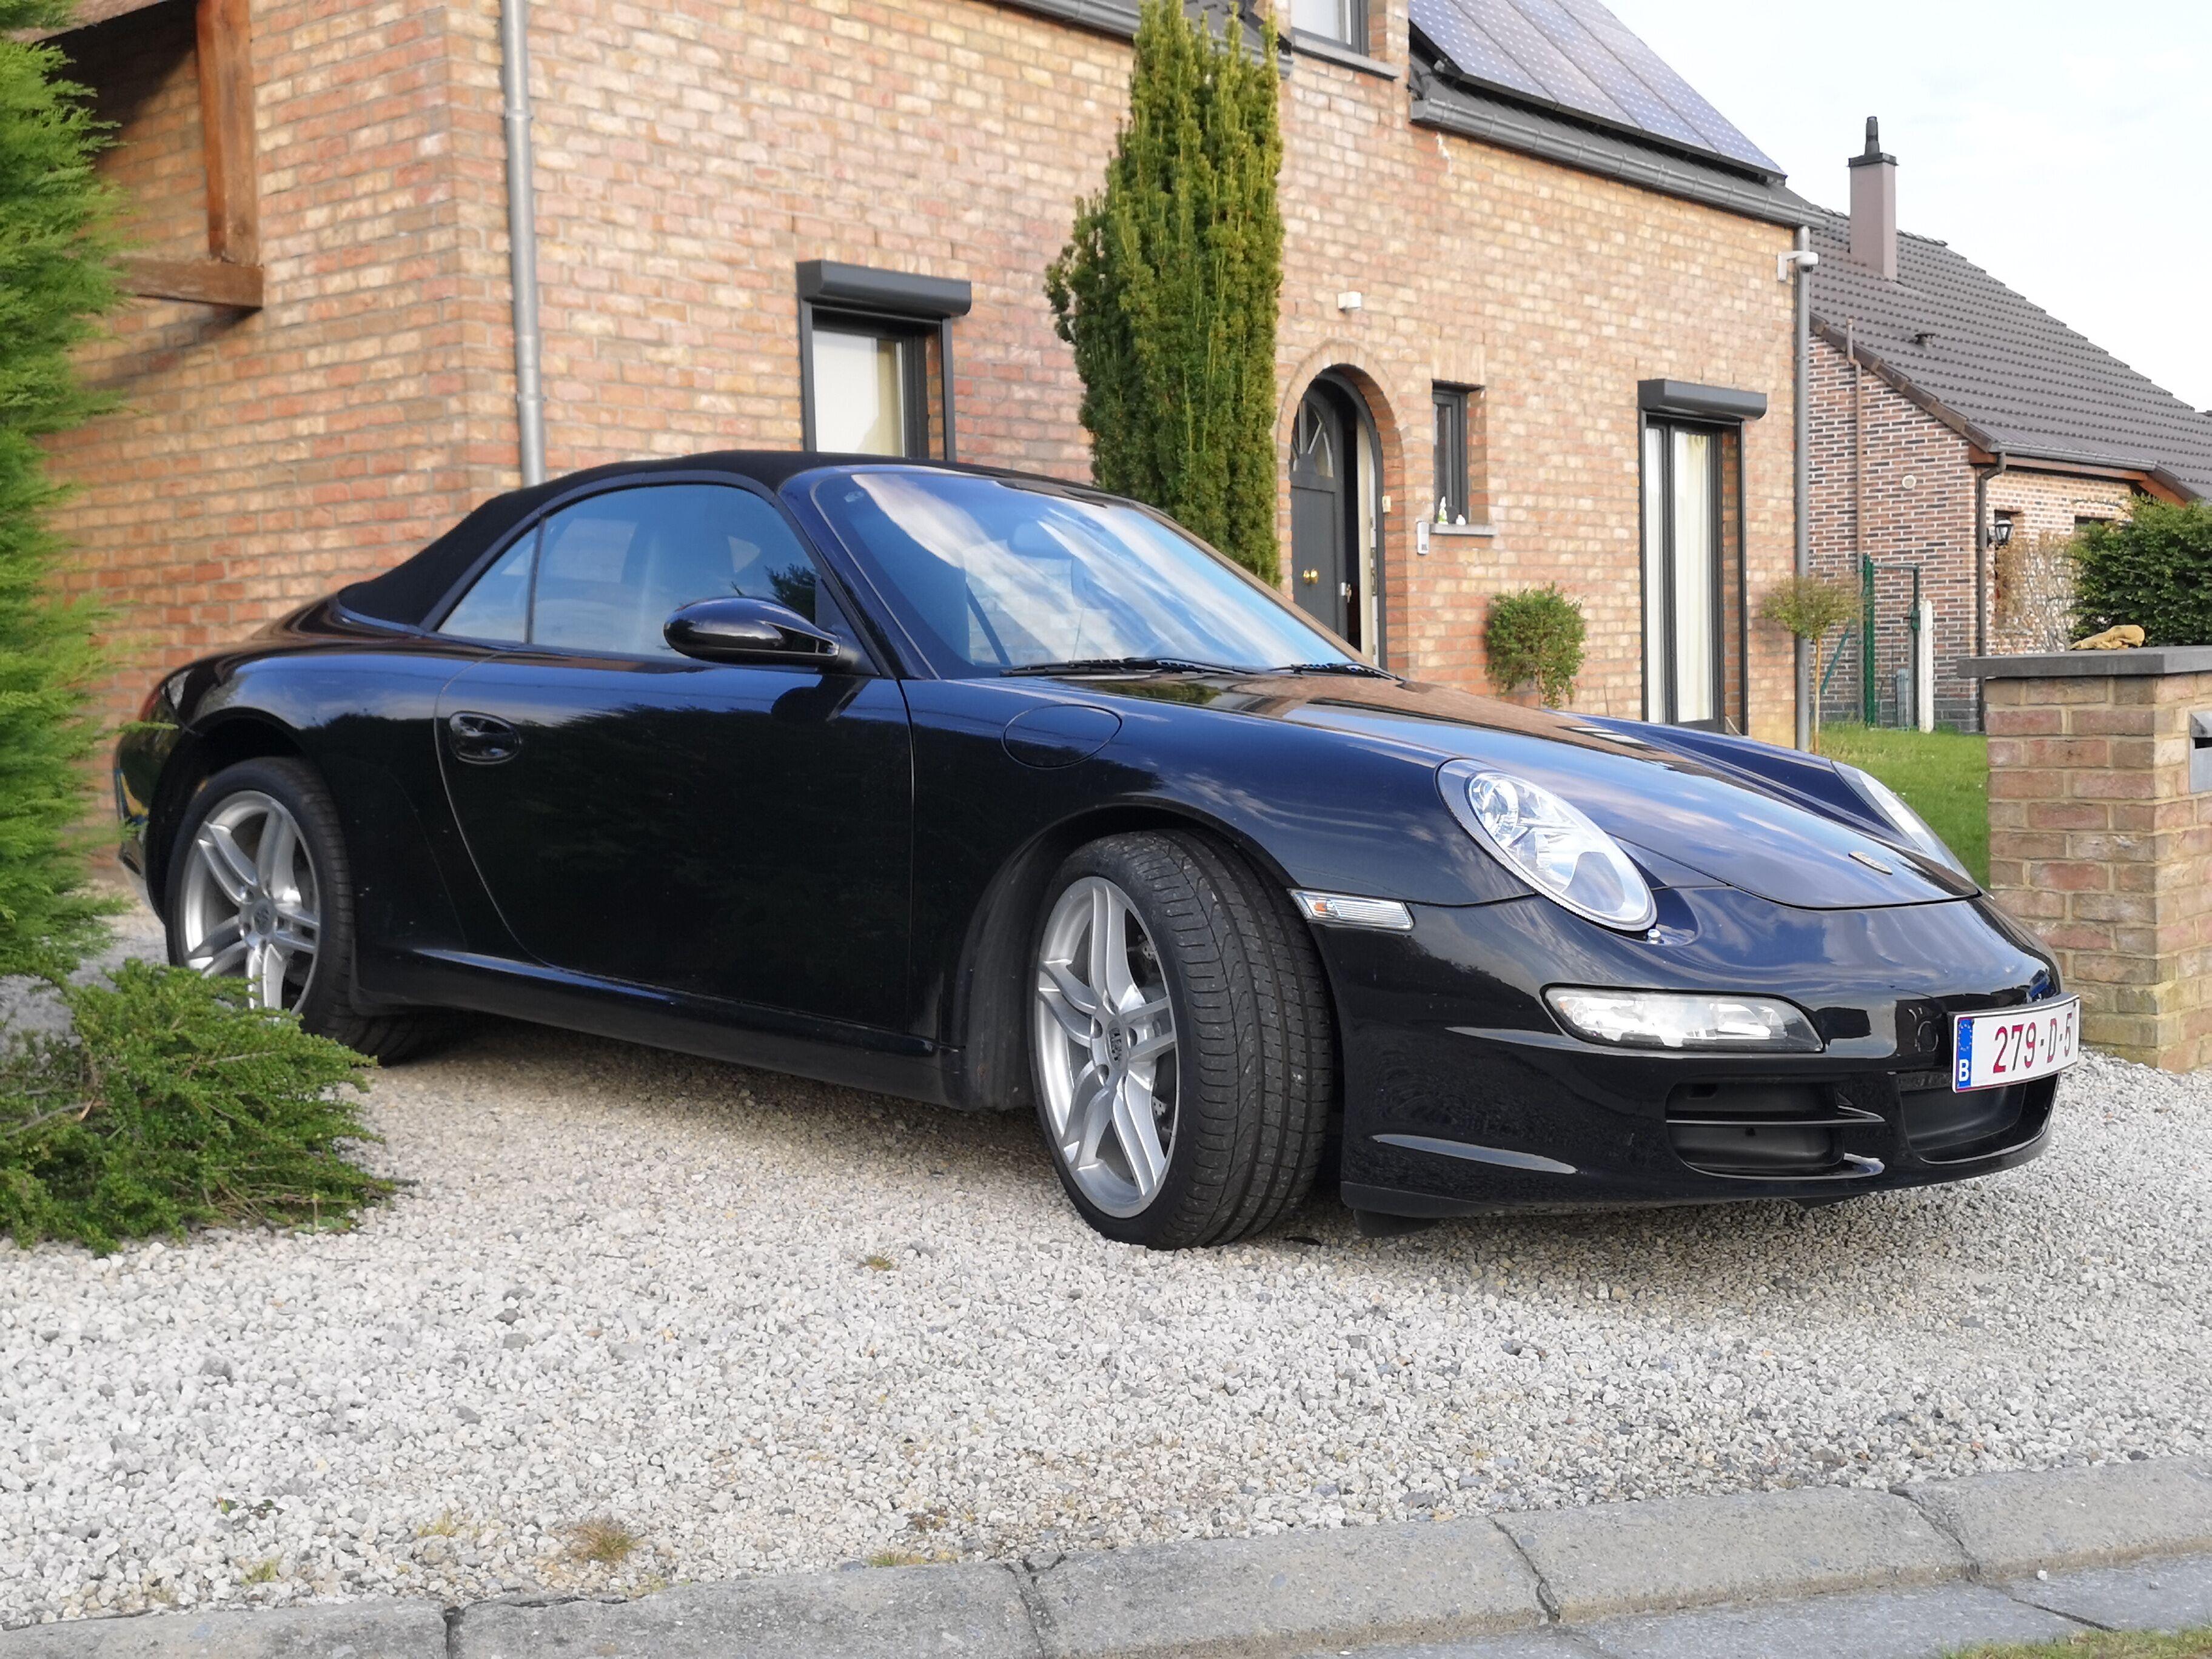 Porsche 911 CARRERA 2 CABRIOLET - 2008 4/15